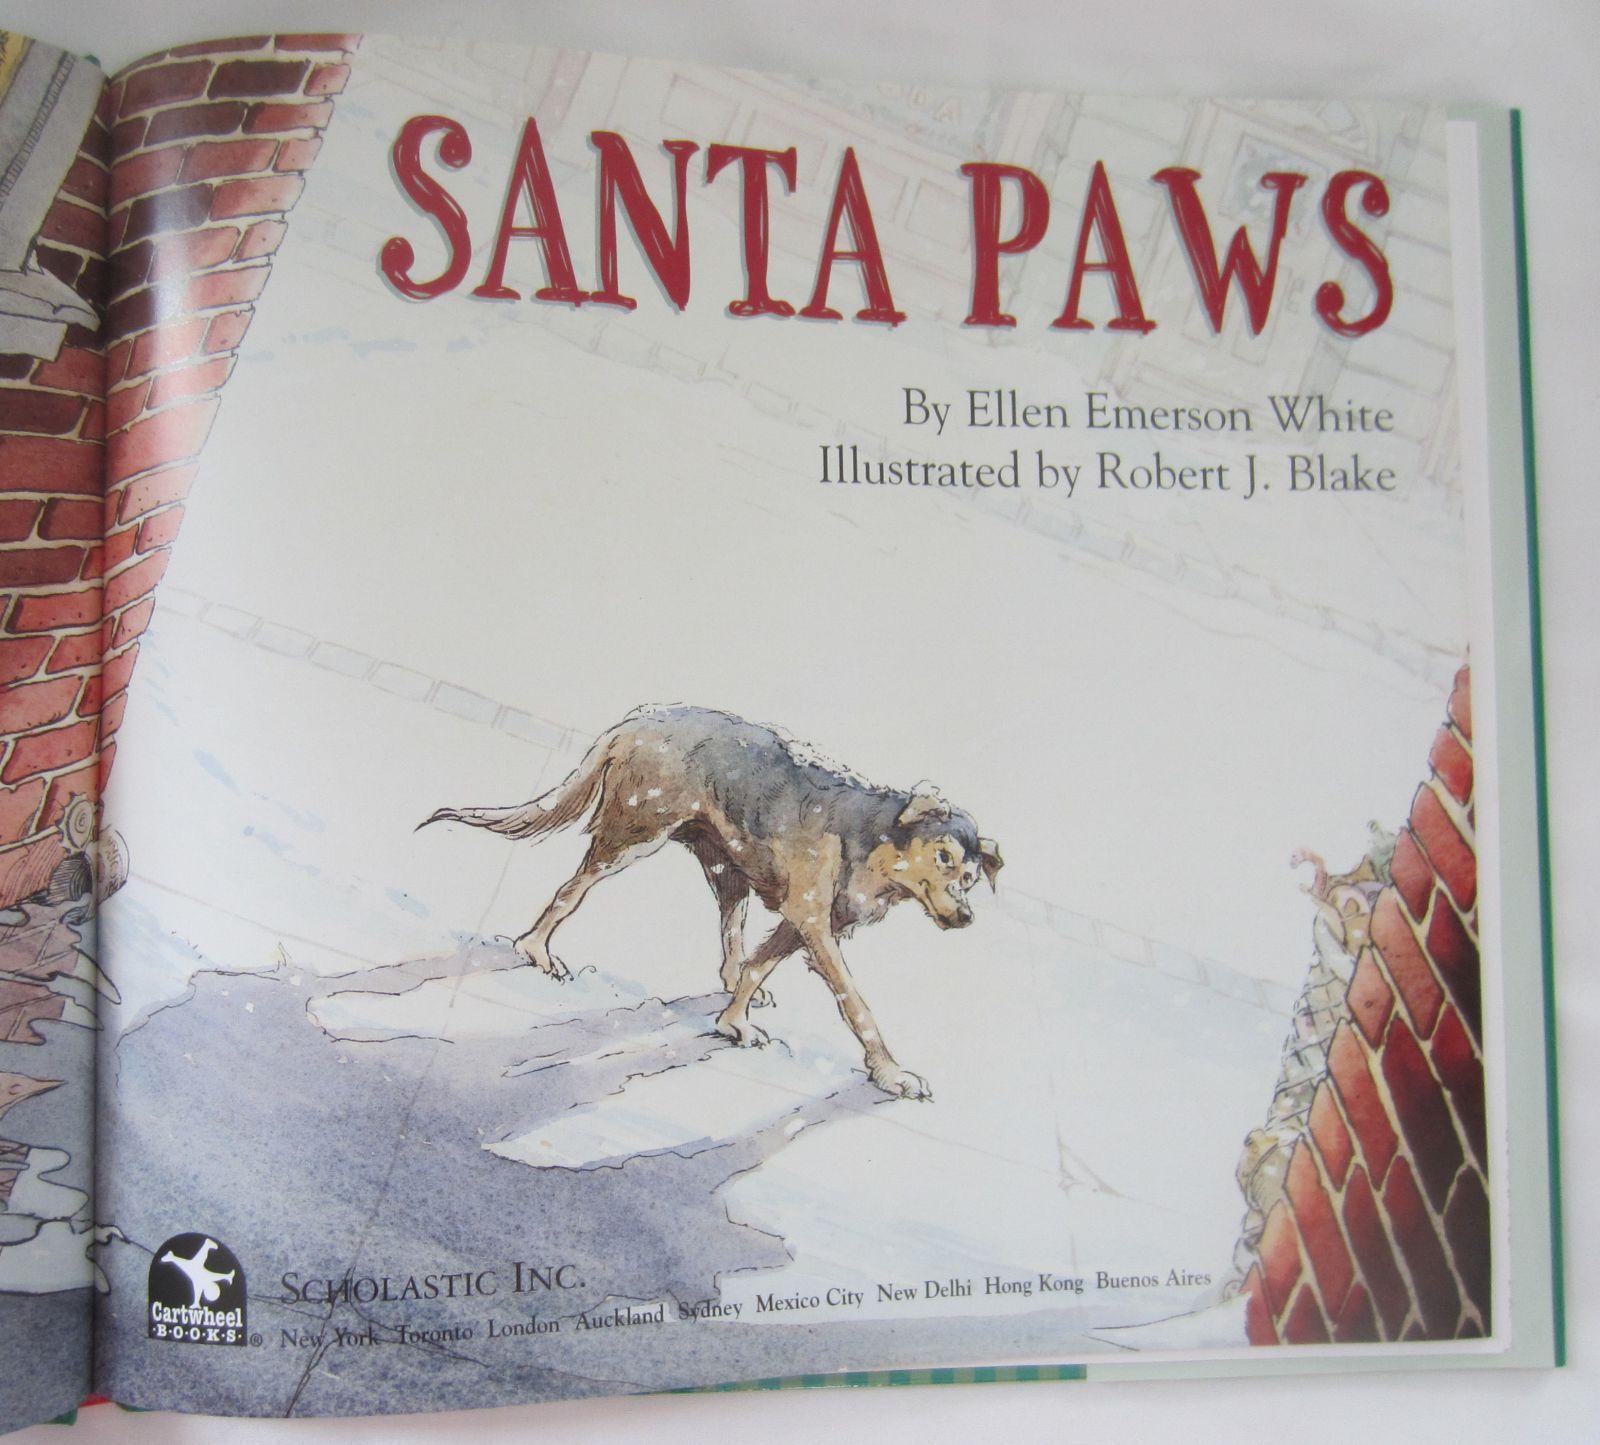 2003 Santa Paws Ellen Emerson White 1st Ed. HC DJ Christmas Book